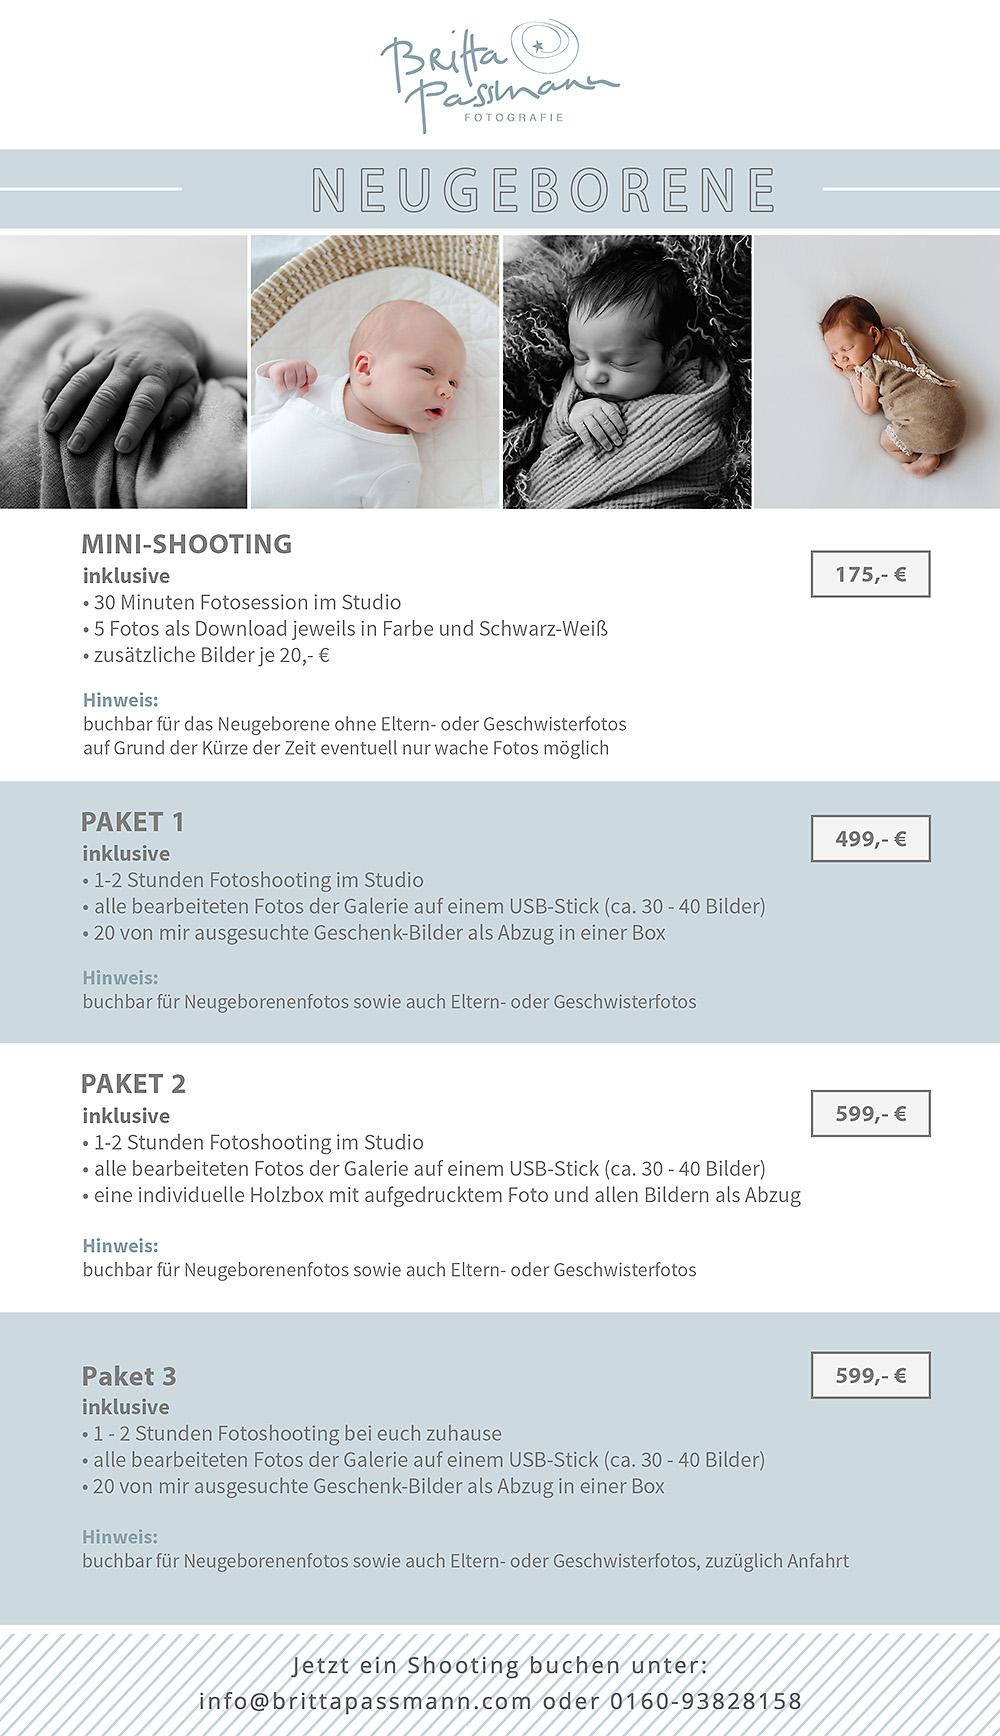 Fotoshooting-Preise-Neugeborene-2018-Dortmund